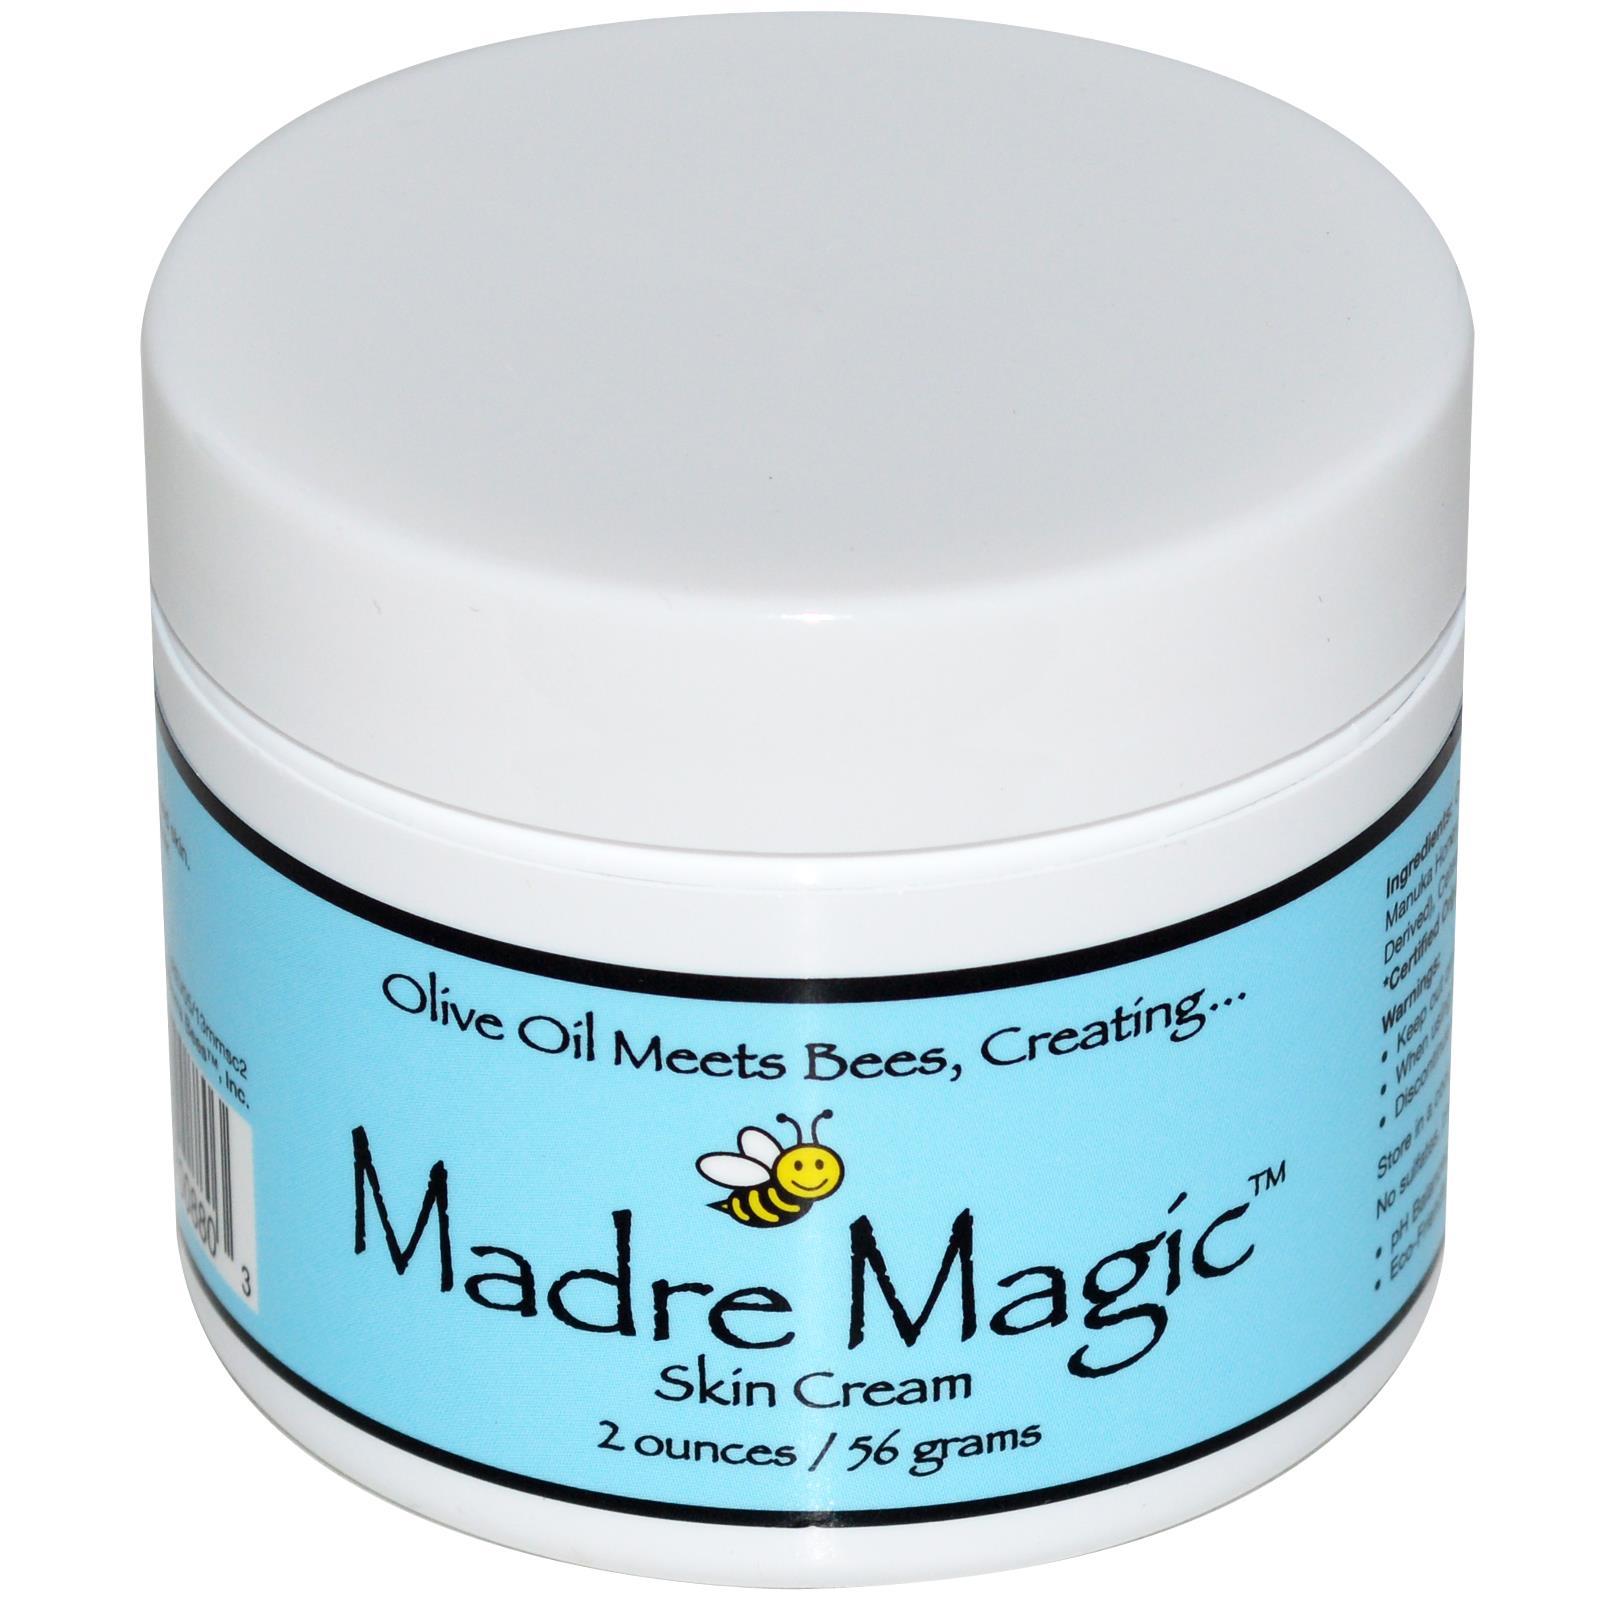 Madre Magic All Purpose Skin Cream Vs Egyptian 10 Off Iherb Argan Oil